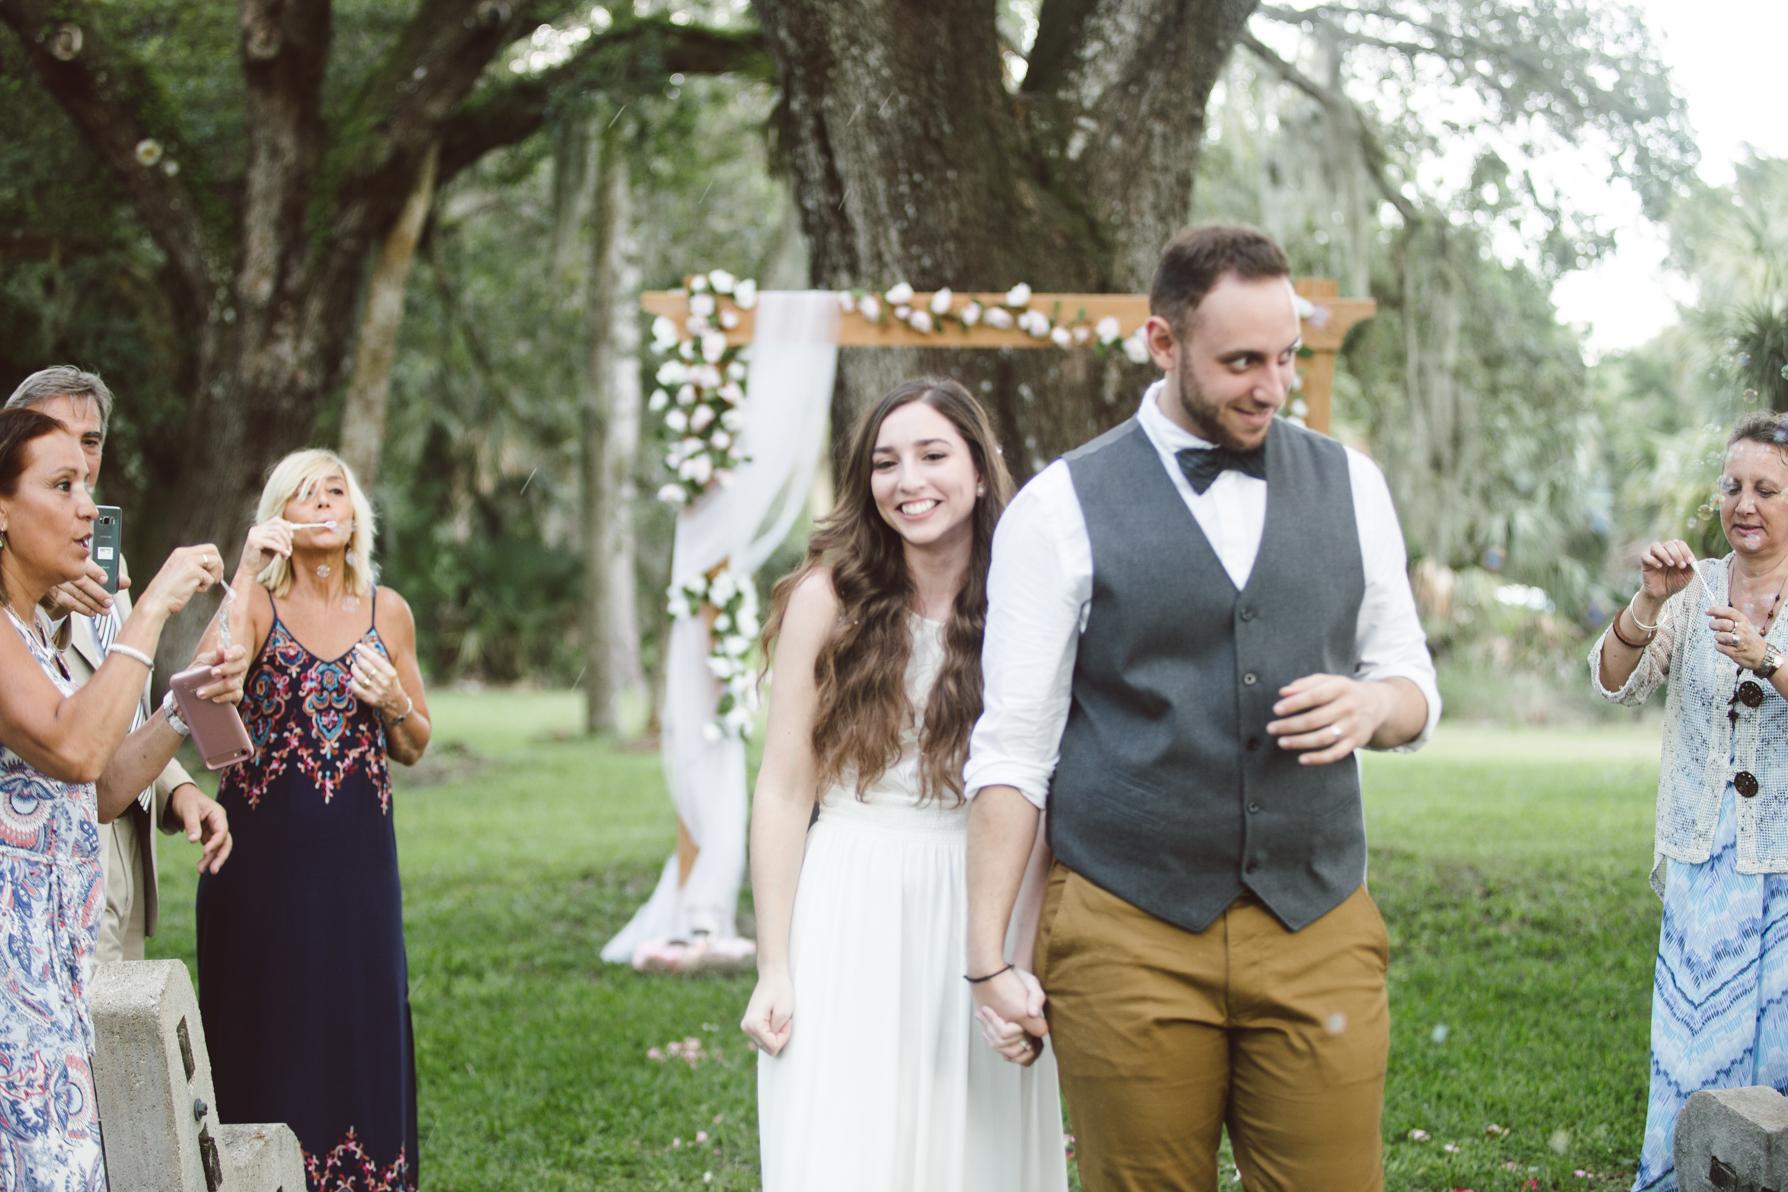 bluestream_wedding_bosisio_hightlights_111-12.jpg